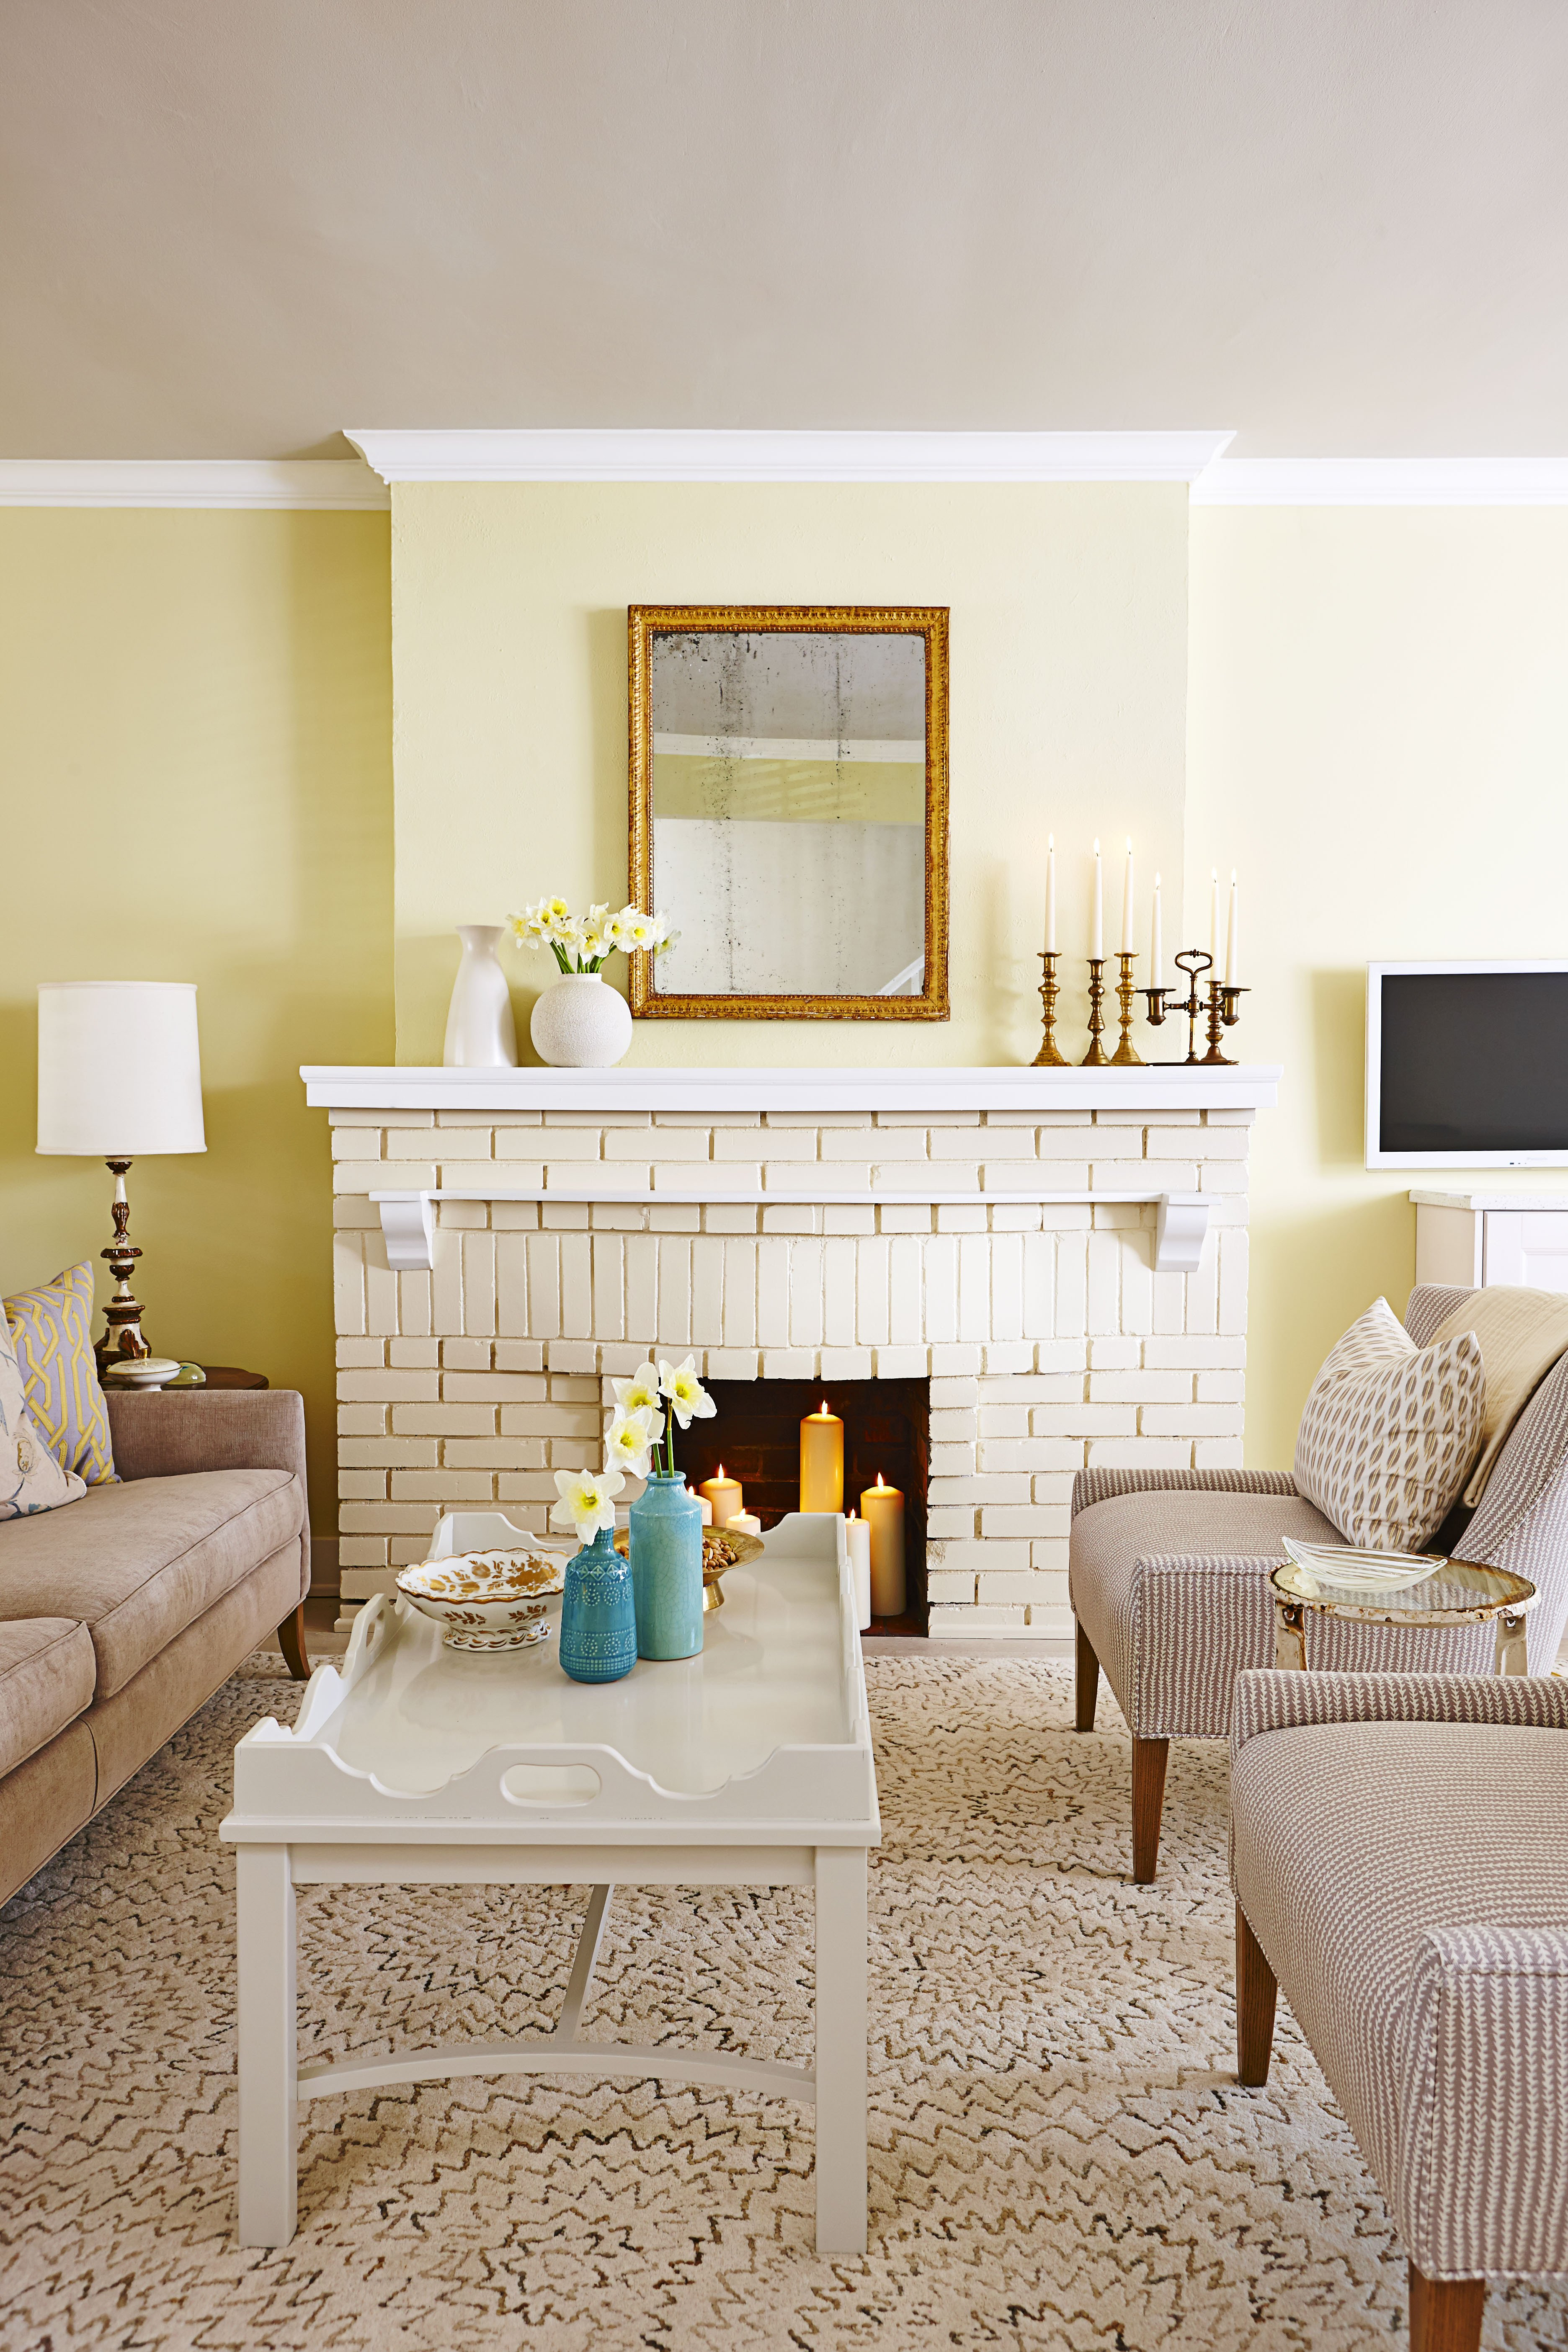 Living Room Decor with Fireplace Beautiful Design Tricks From Sarah Richardson Sunny Serene House tour